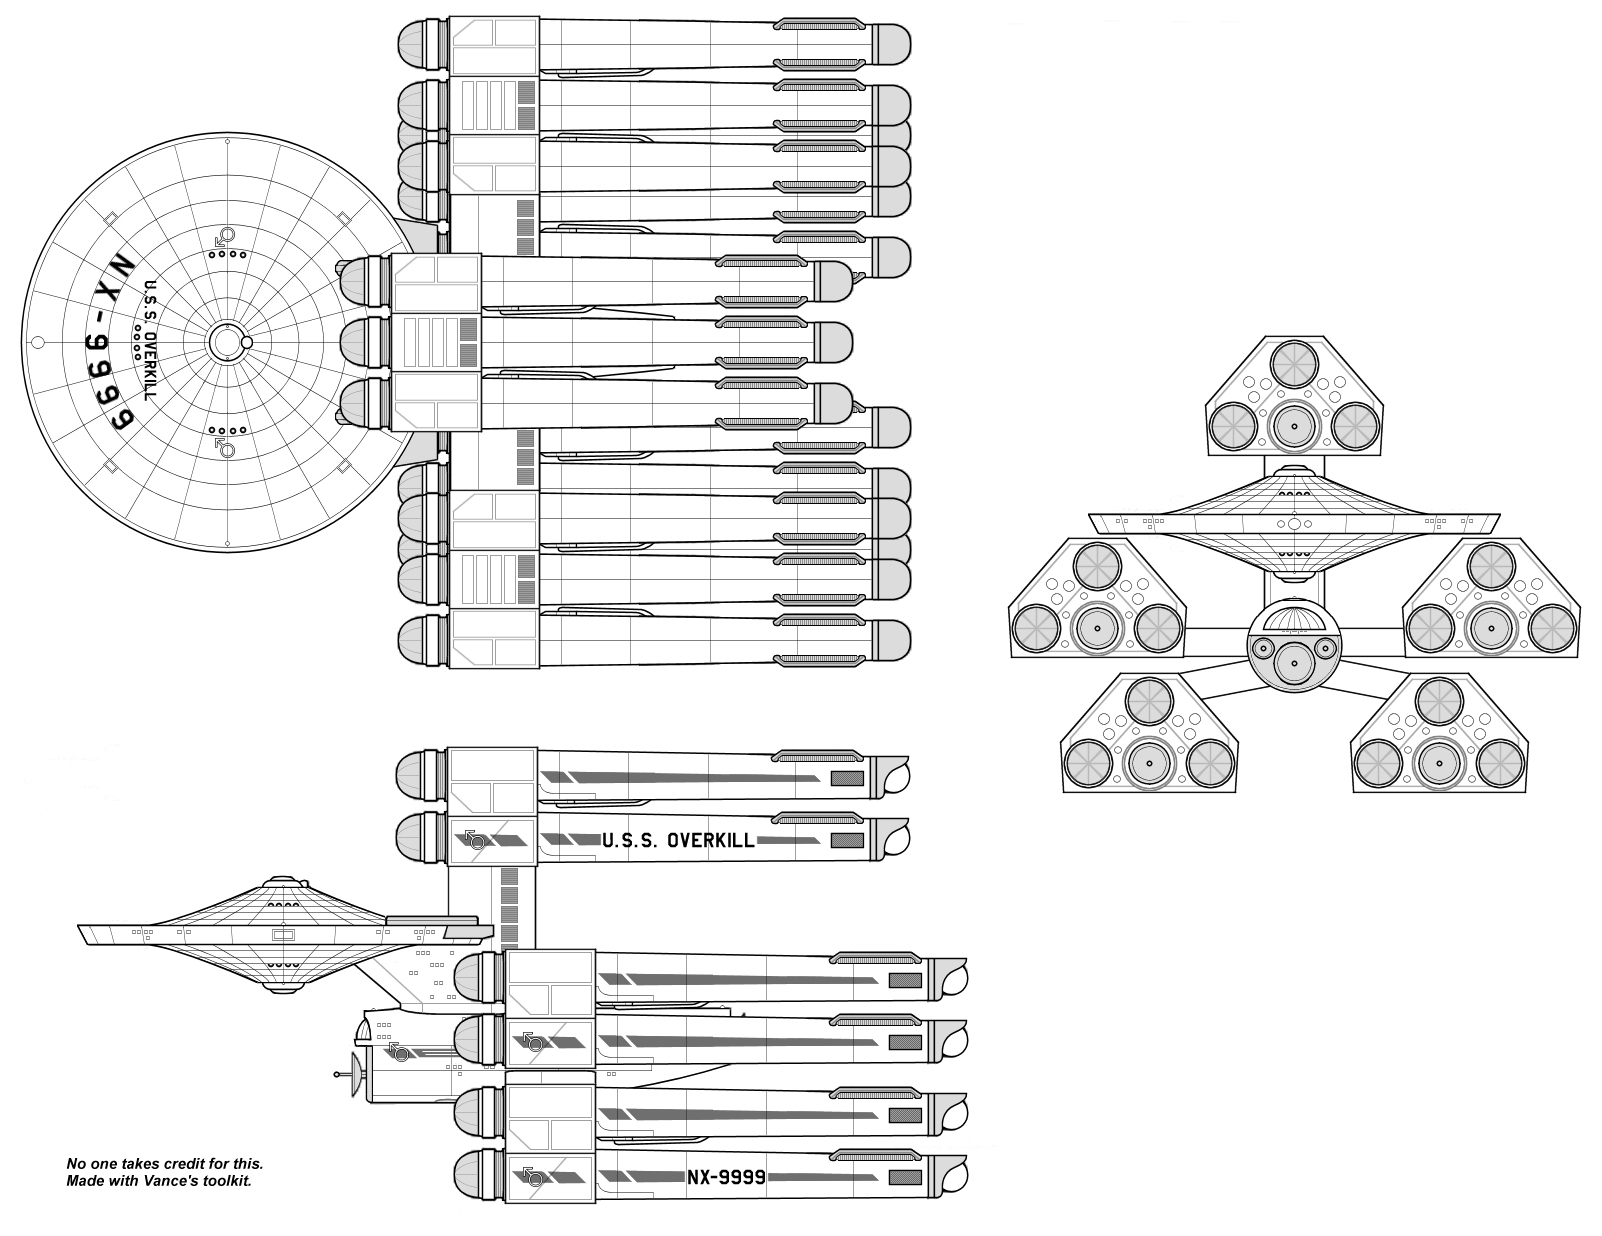 Schematics Made With Vance S Toolkit